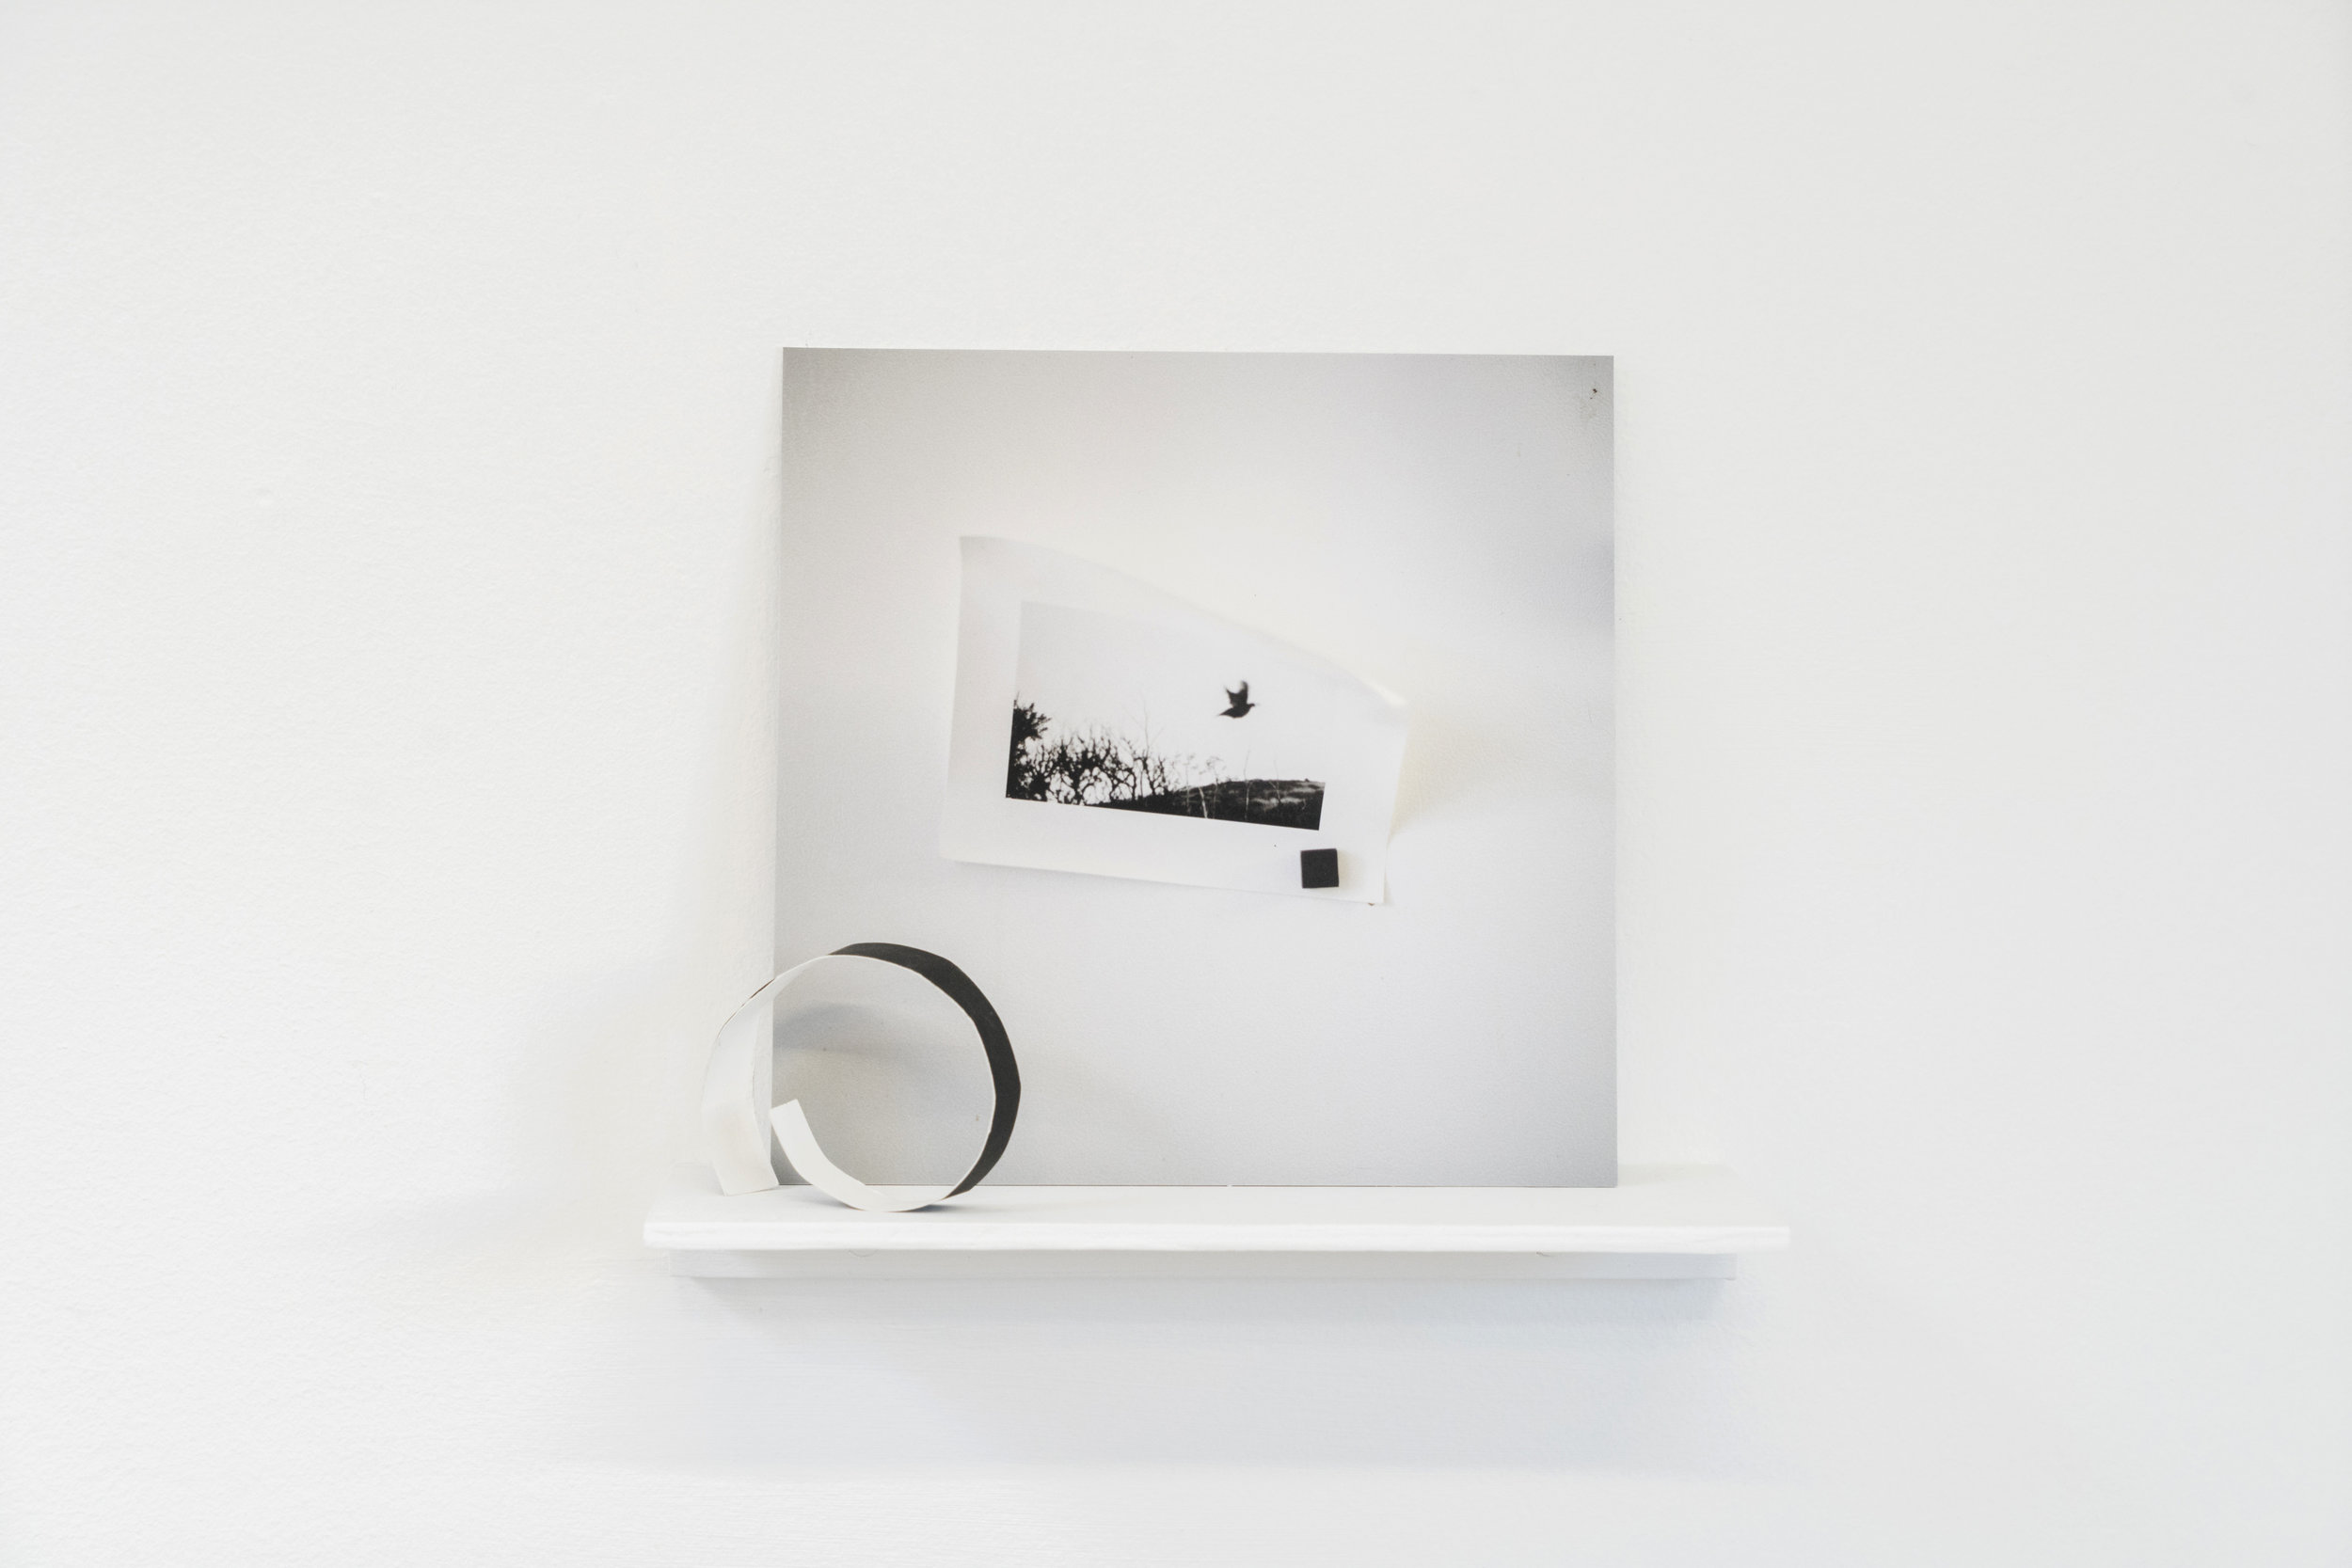 Elizabeth Bernstein,  Something opened…,  2017, Archival pigment print, aluminum, wood, 10 x 8 x 3 inches.